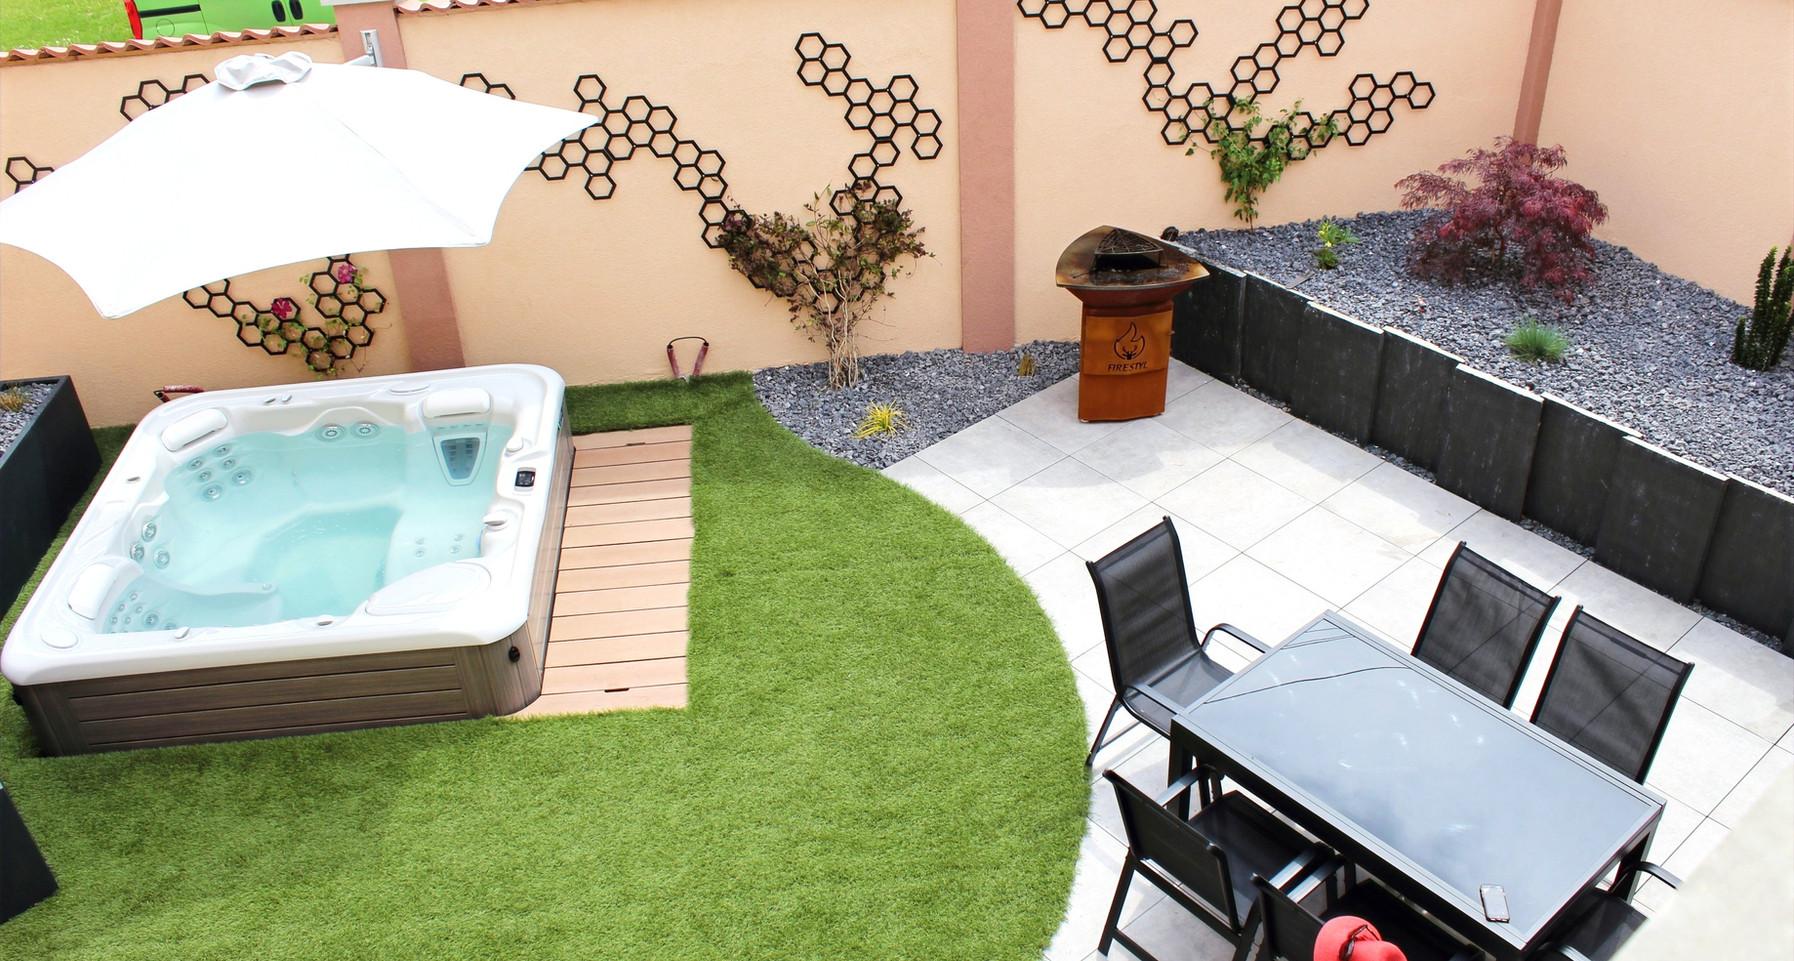 terrasse-spa-maison-qualite-paysage-1_ed